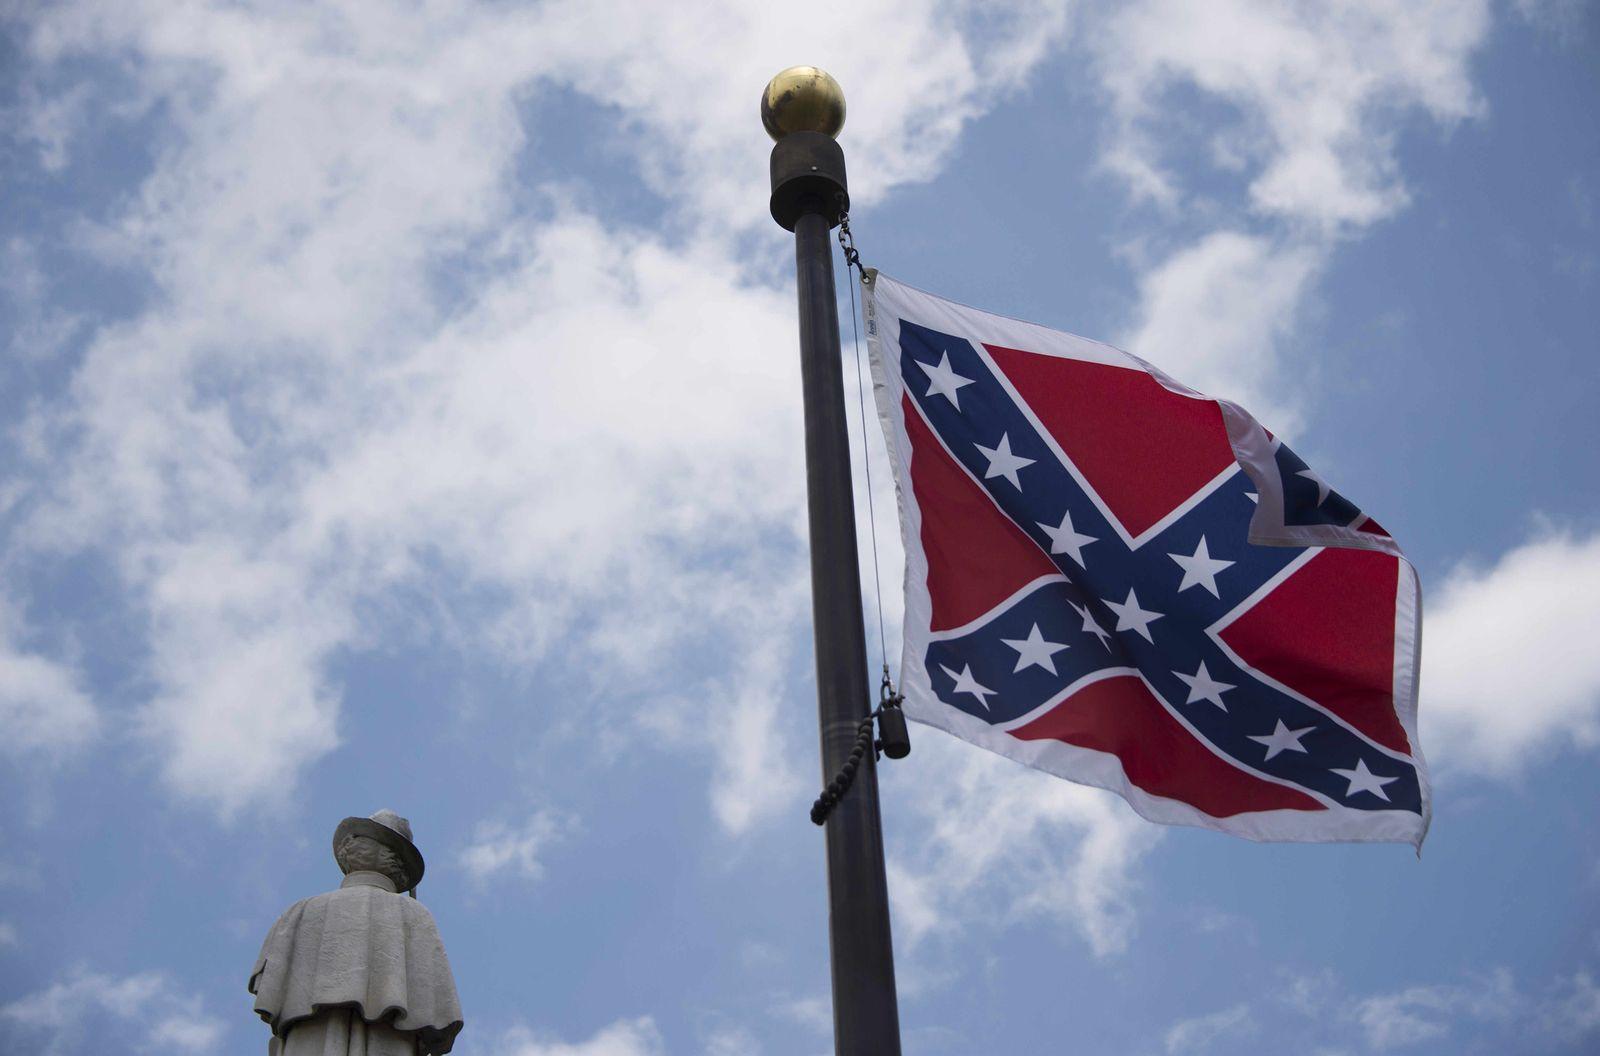 US-SHOOTING-CHARLESTON-CONFEDERATE-FLAG